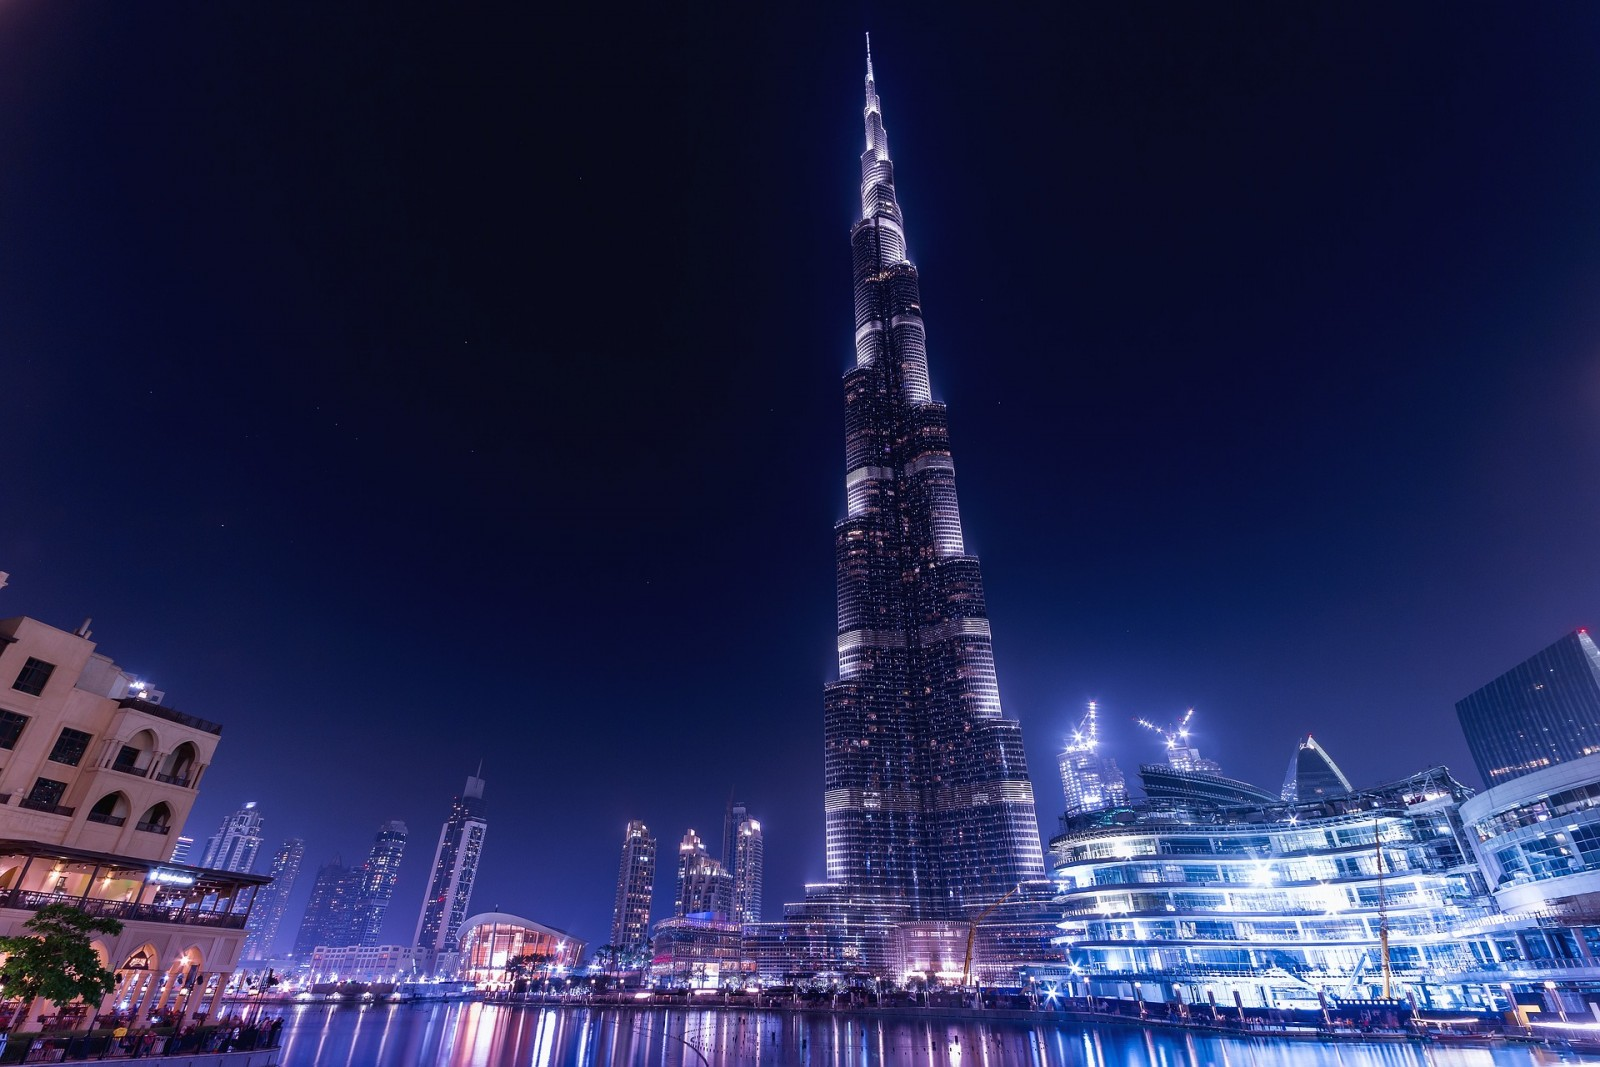 Burj khalifa, Dubai, Emirates, Pixabay.com